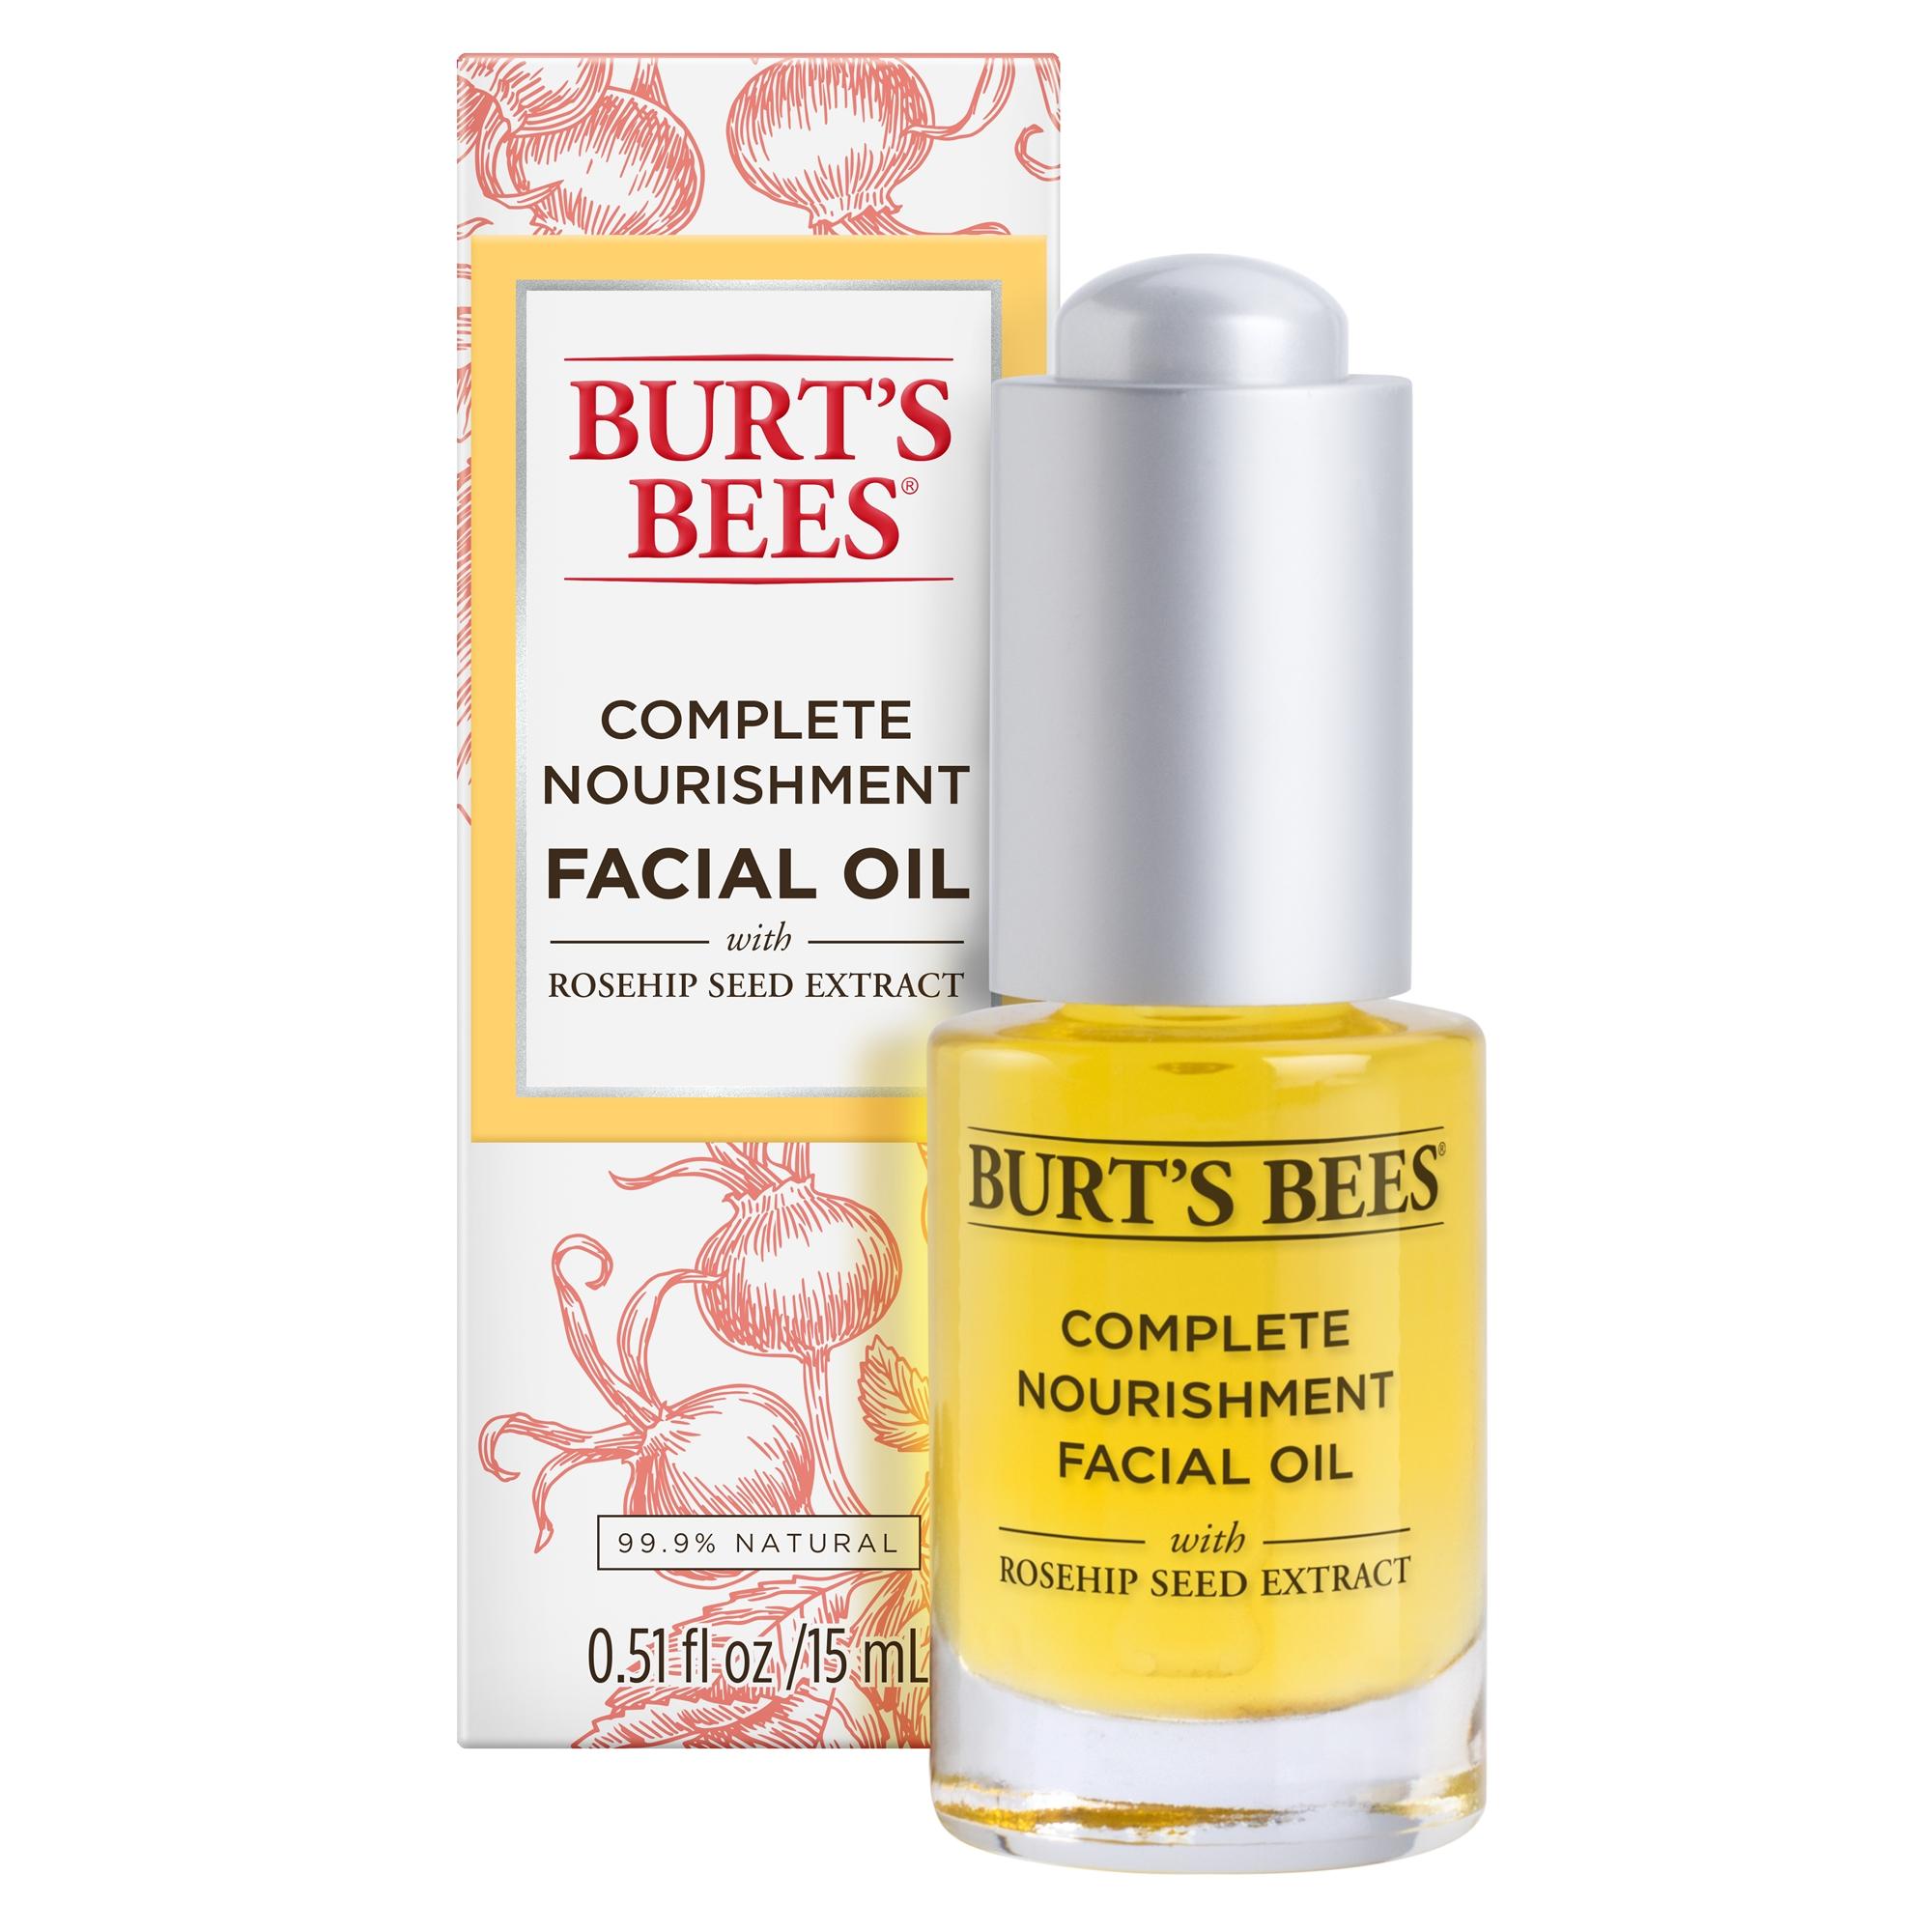 Burt's Bees Complete Nourishment Facial Oil, Anti-Aging Oil,  0.51 oz